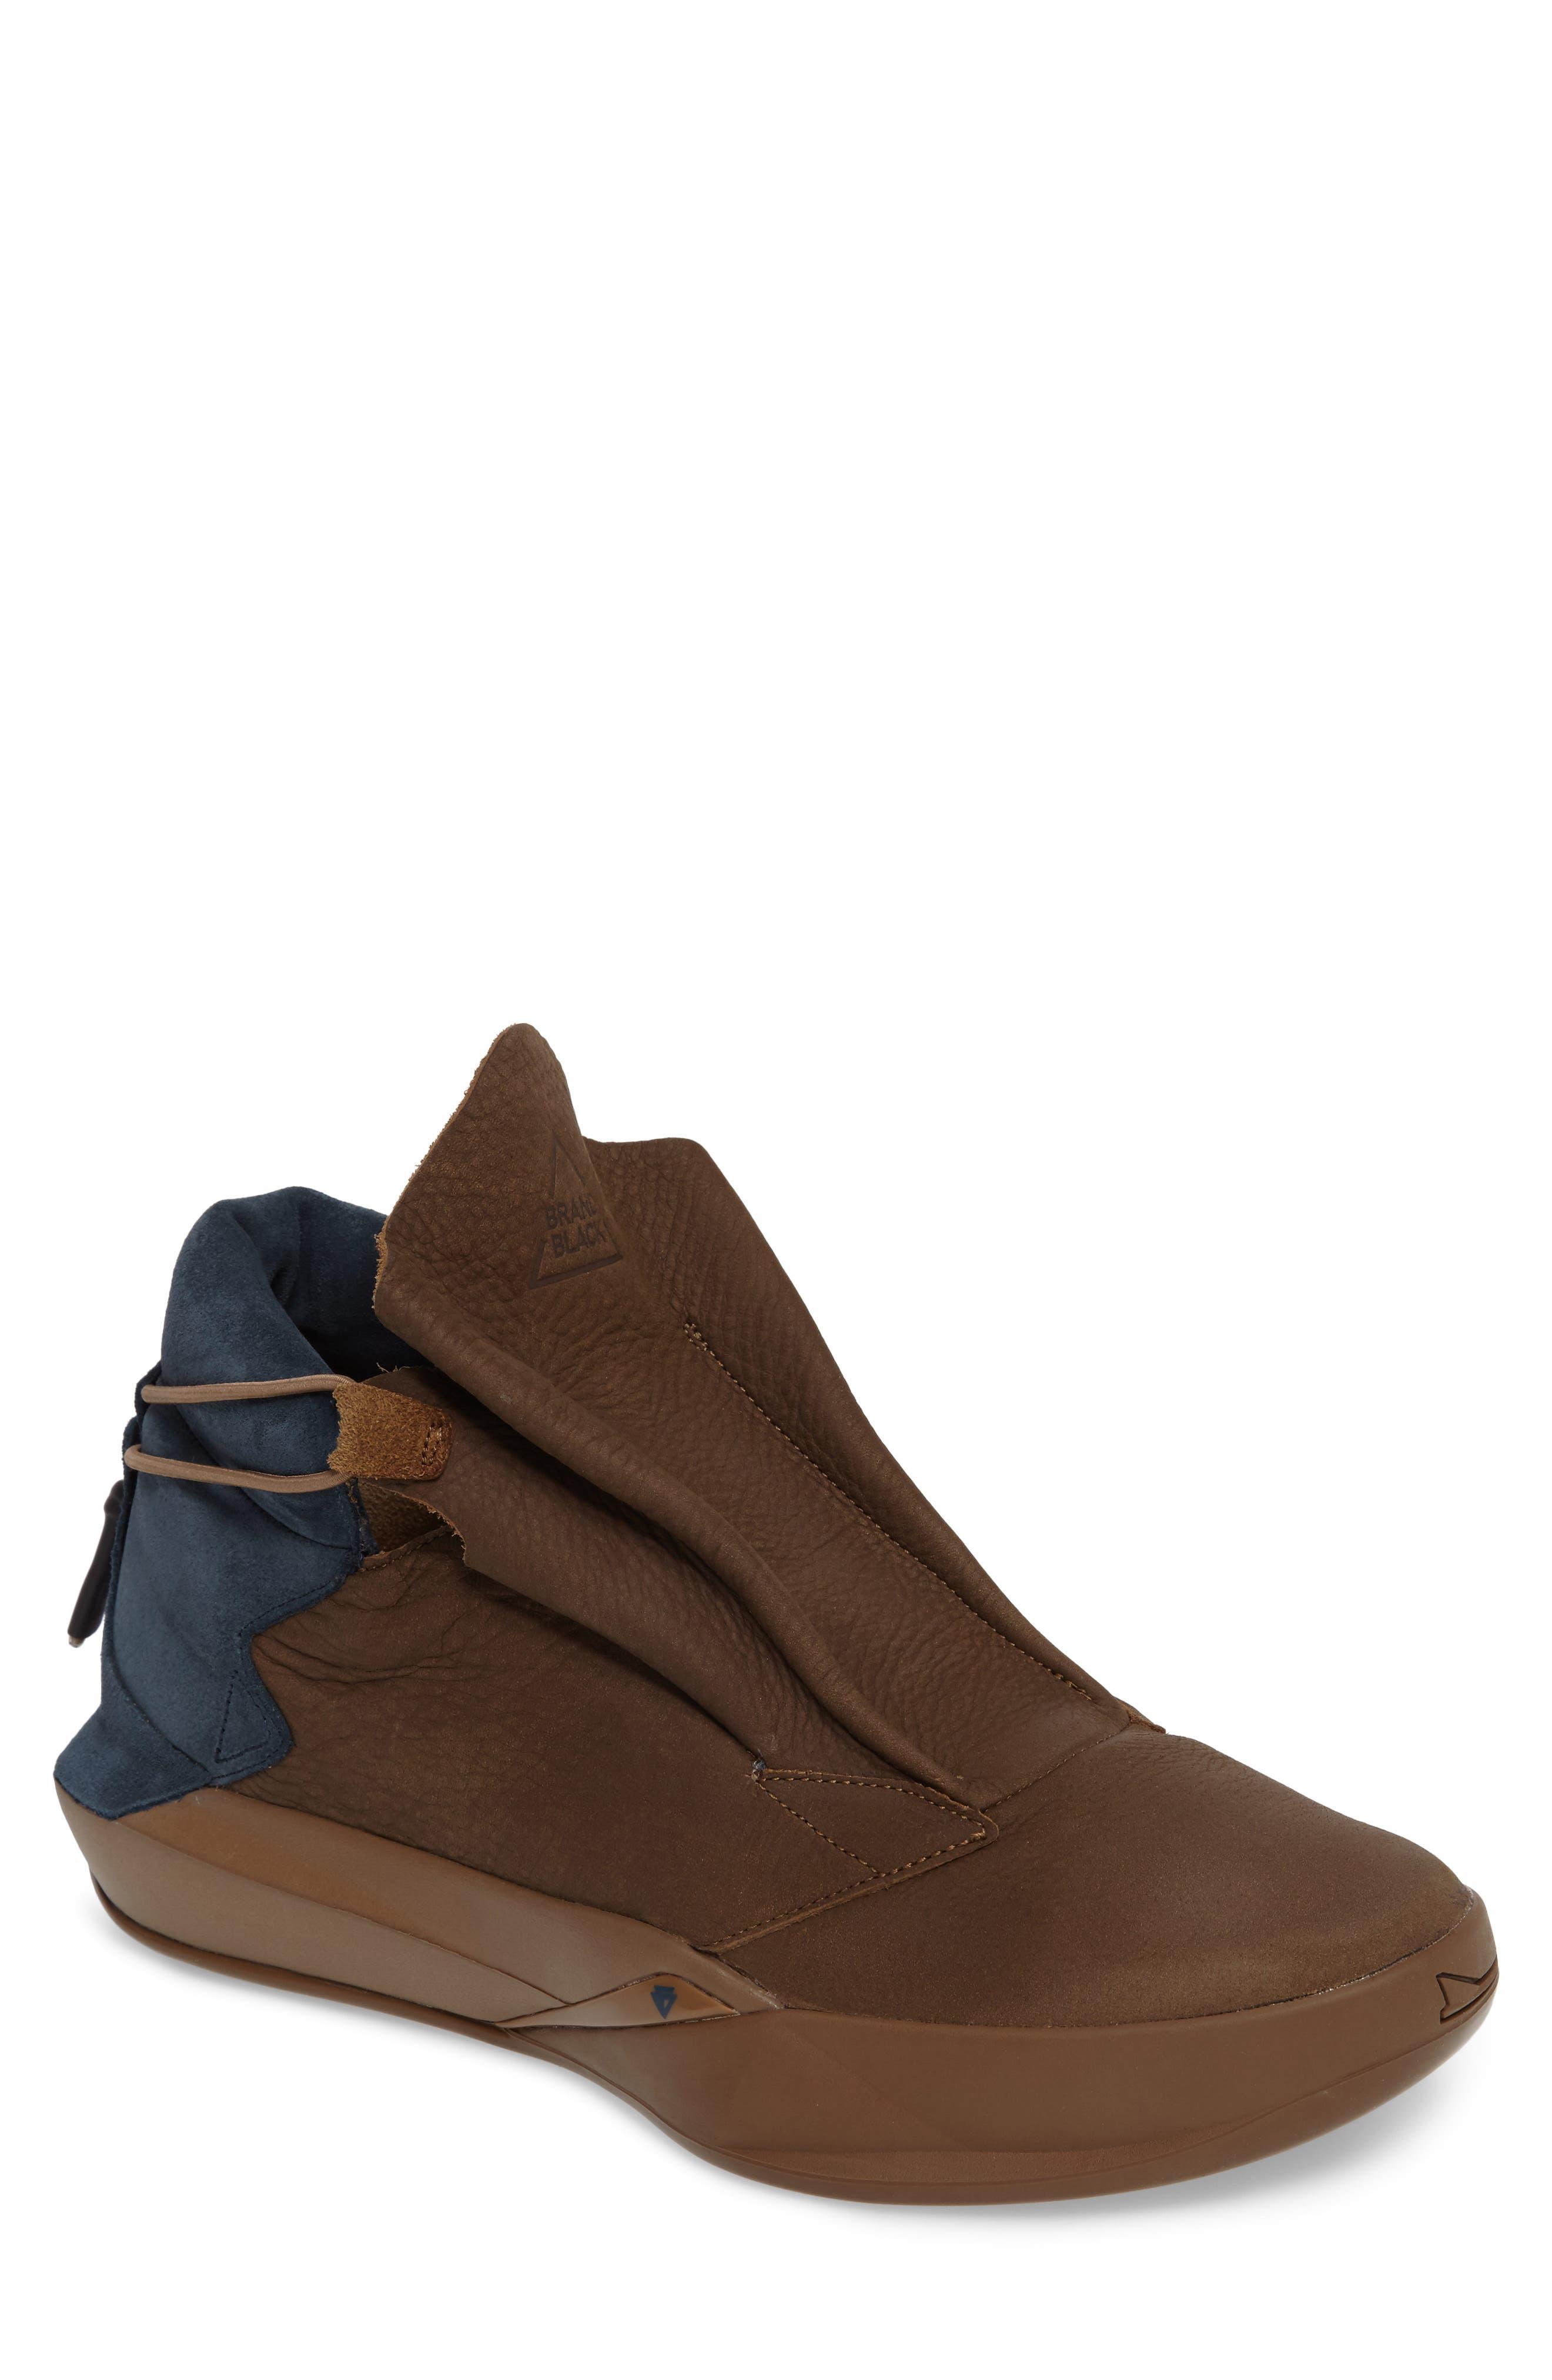 Future Legend Boot,                         Main,                         color, BRN -BROWN